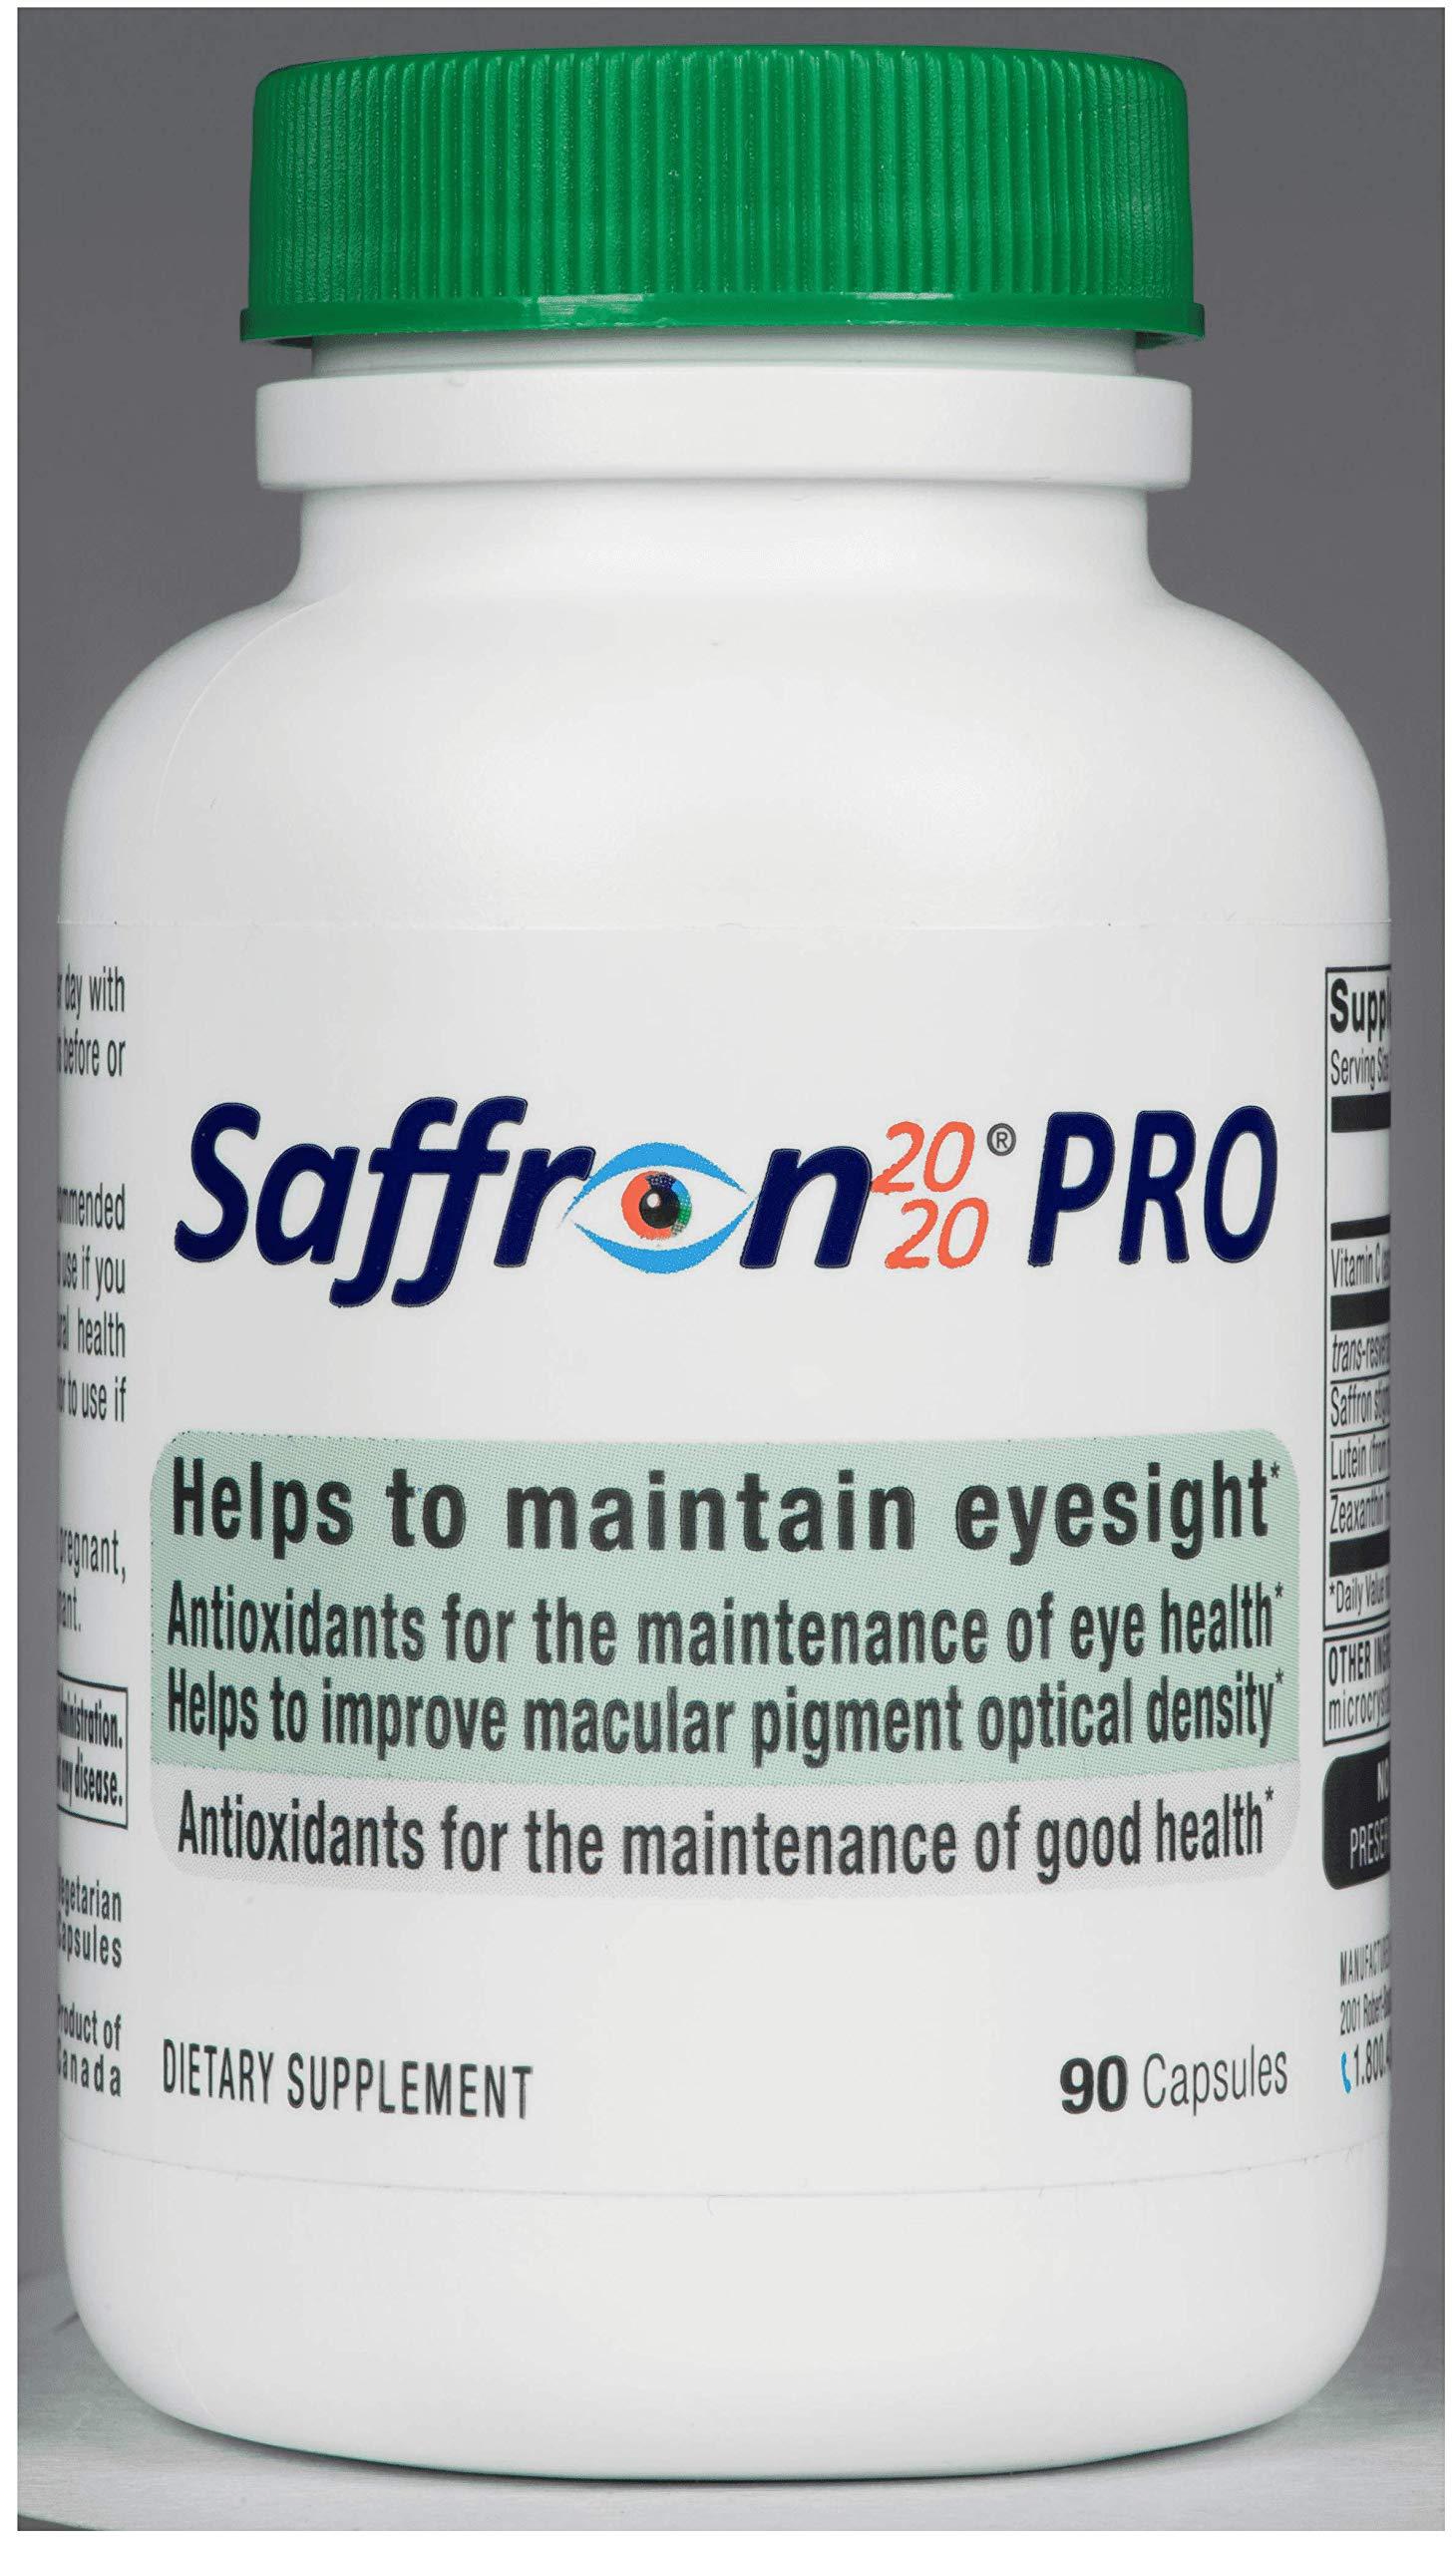 2020 PRO Supplement Provides pigments Eyesight